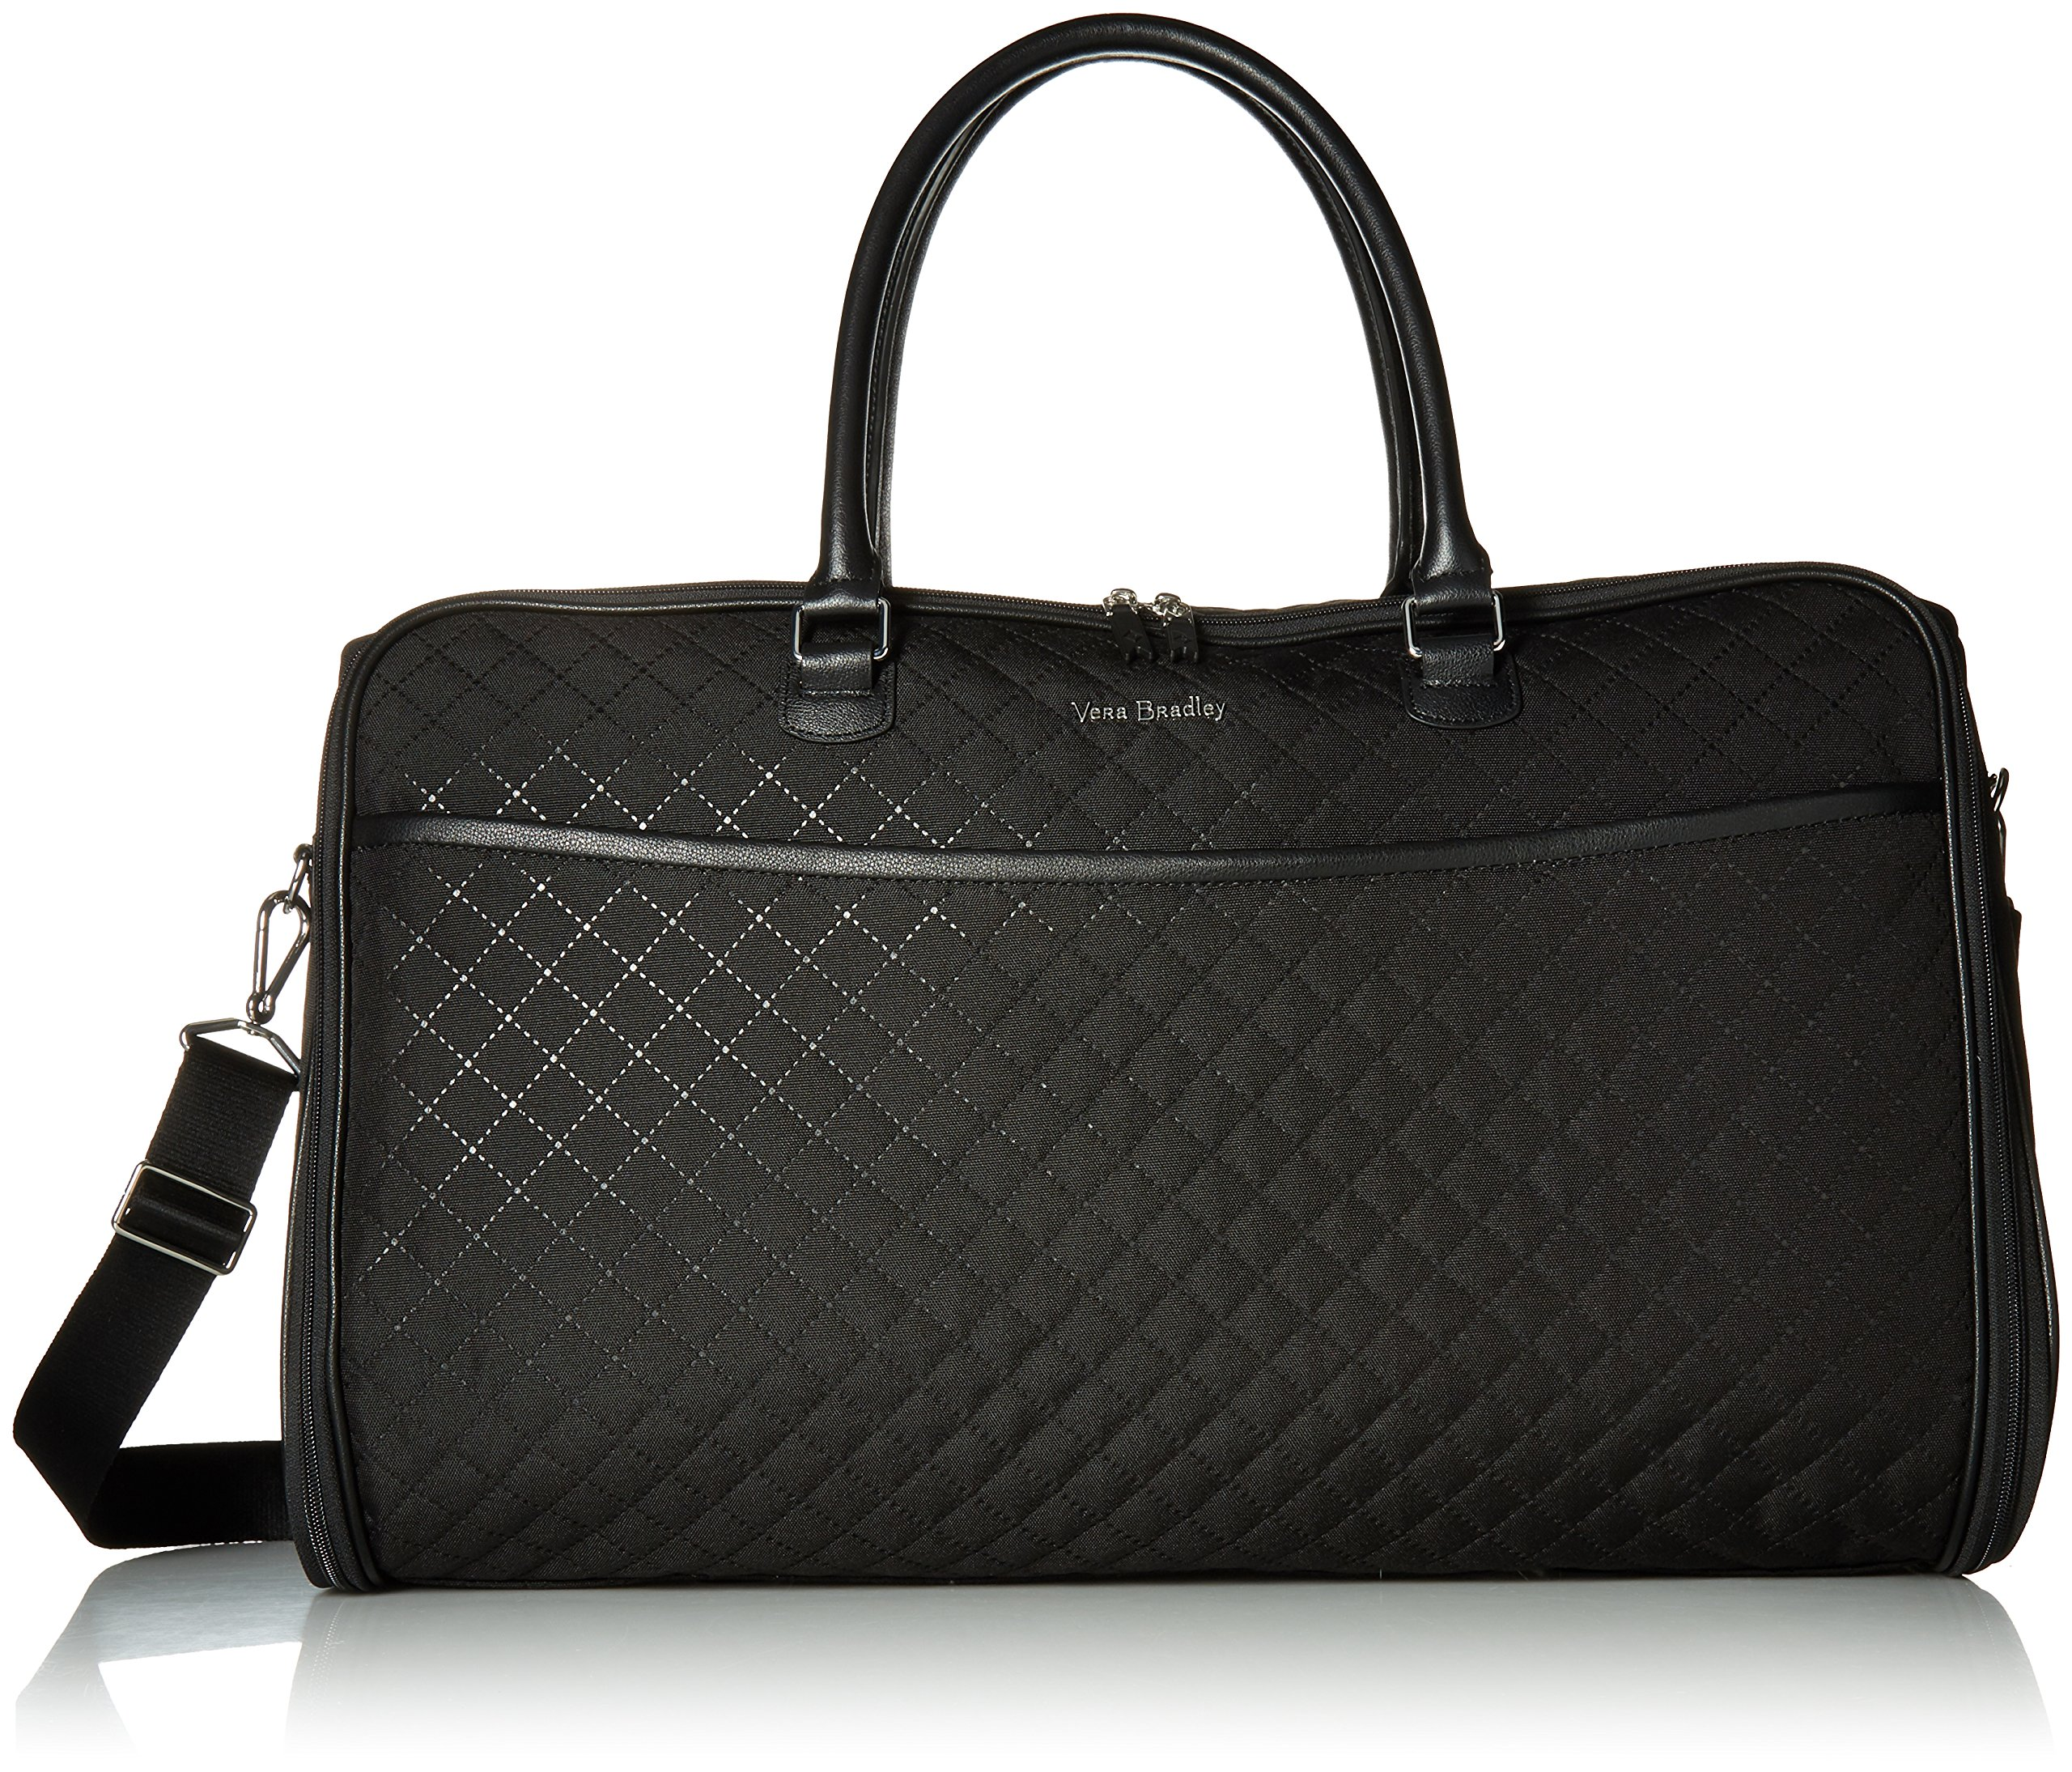 Vera Bradley Iconic Convertible Garment Bag, Classic Black Black